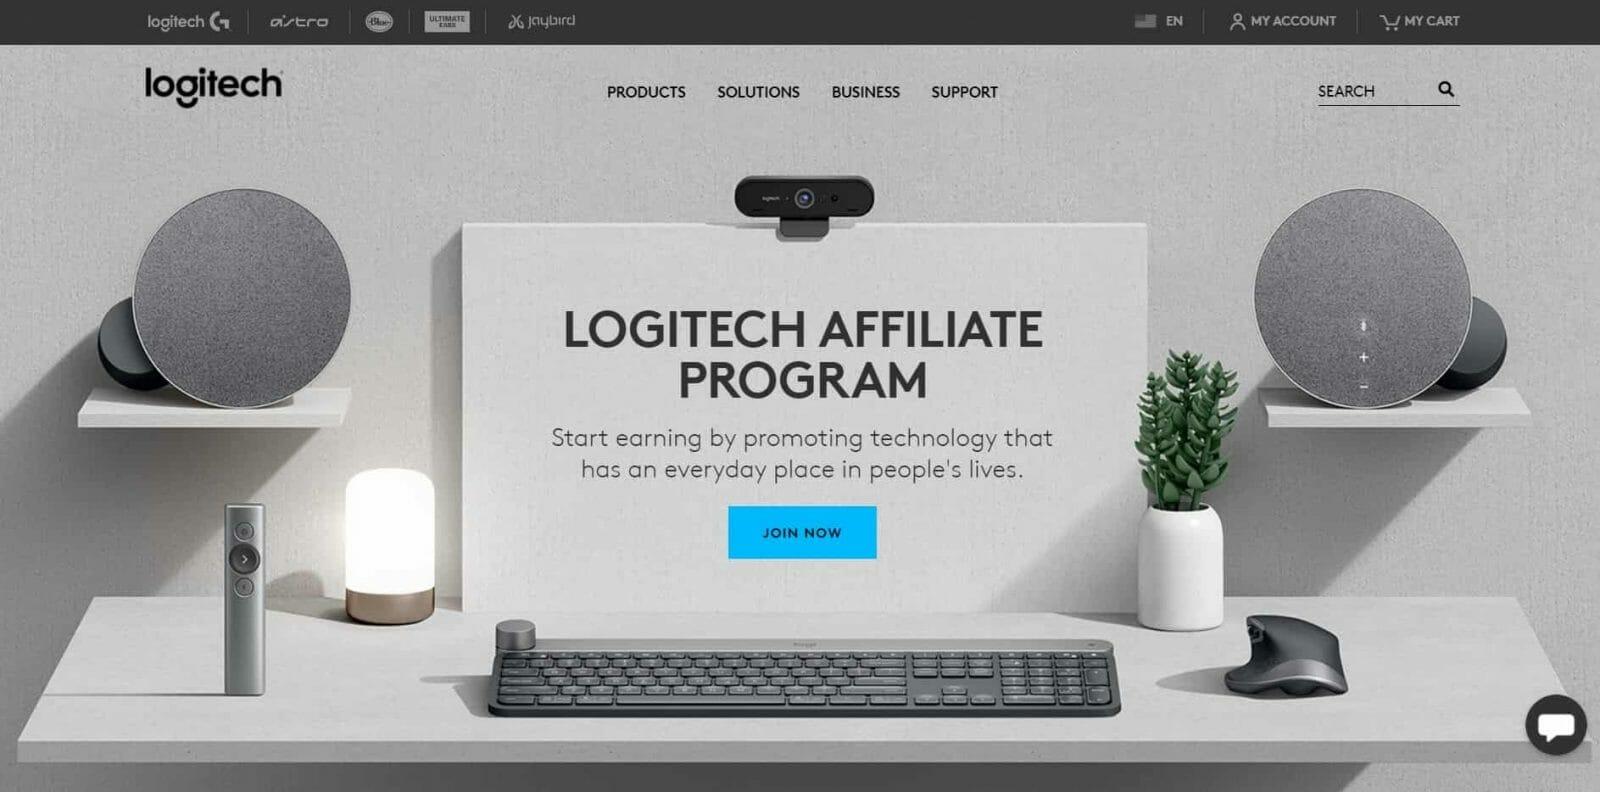 Logitech Affiliate Program